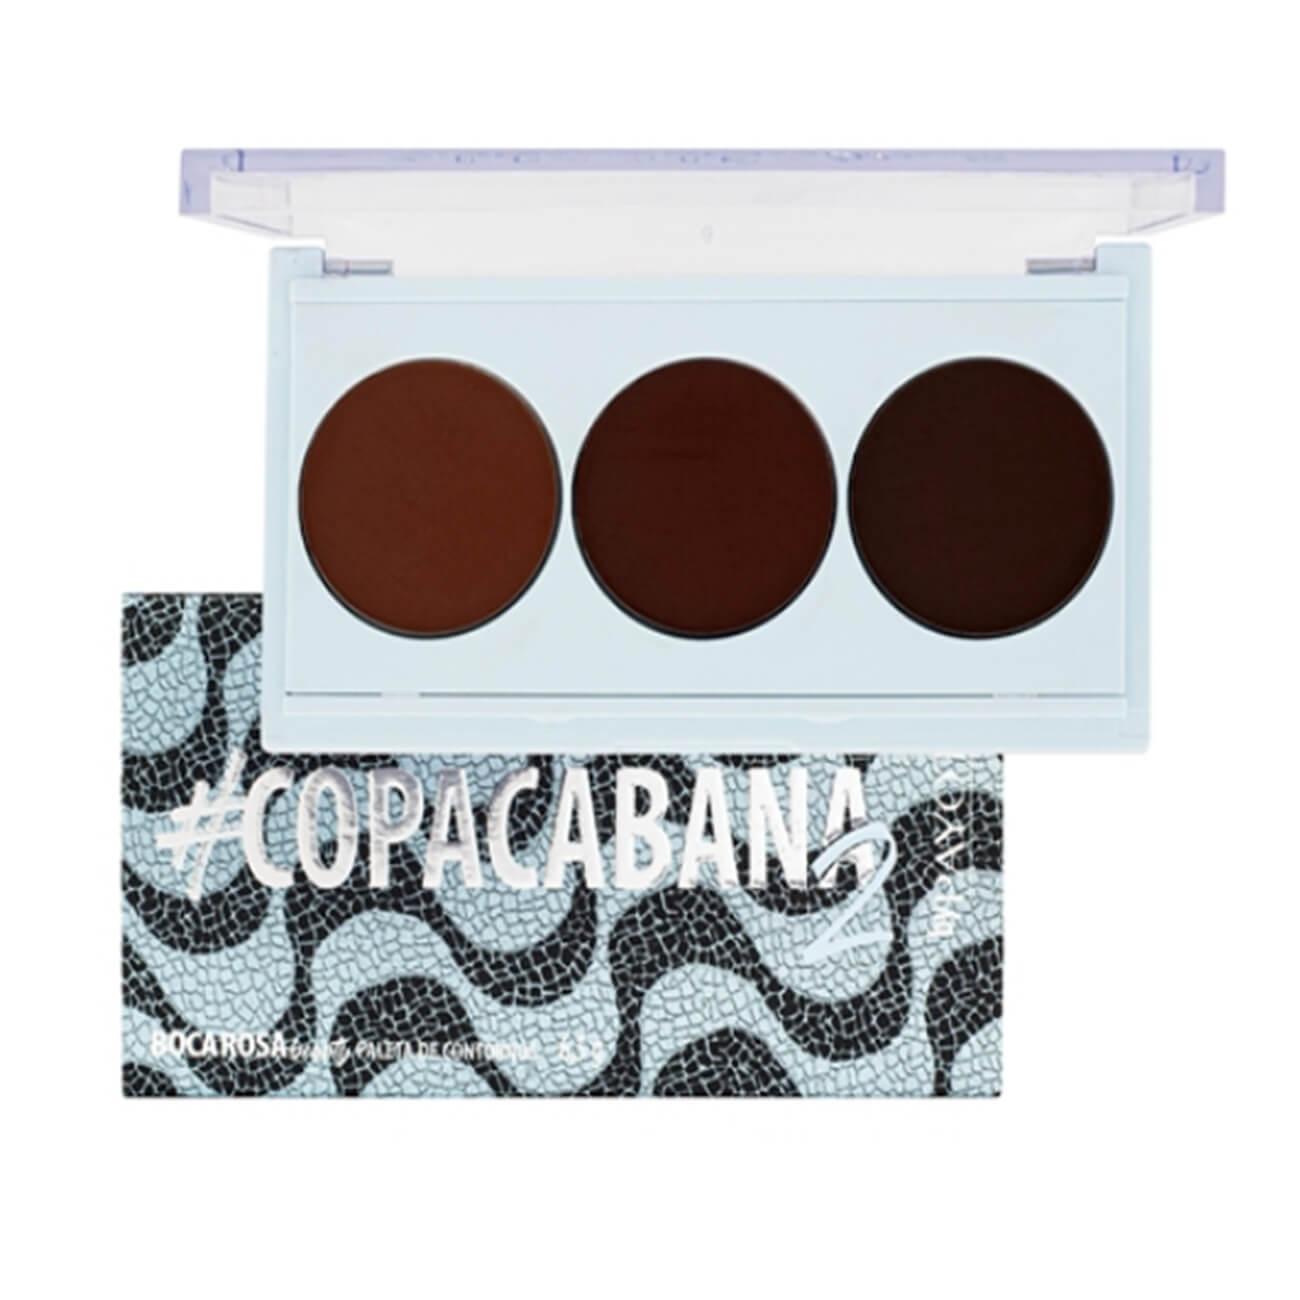 Paleta de Contorno #Copacabana2 - Boca Rosa Beauty